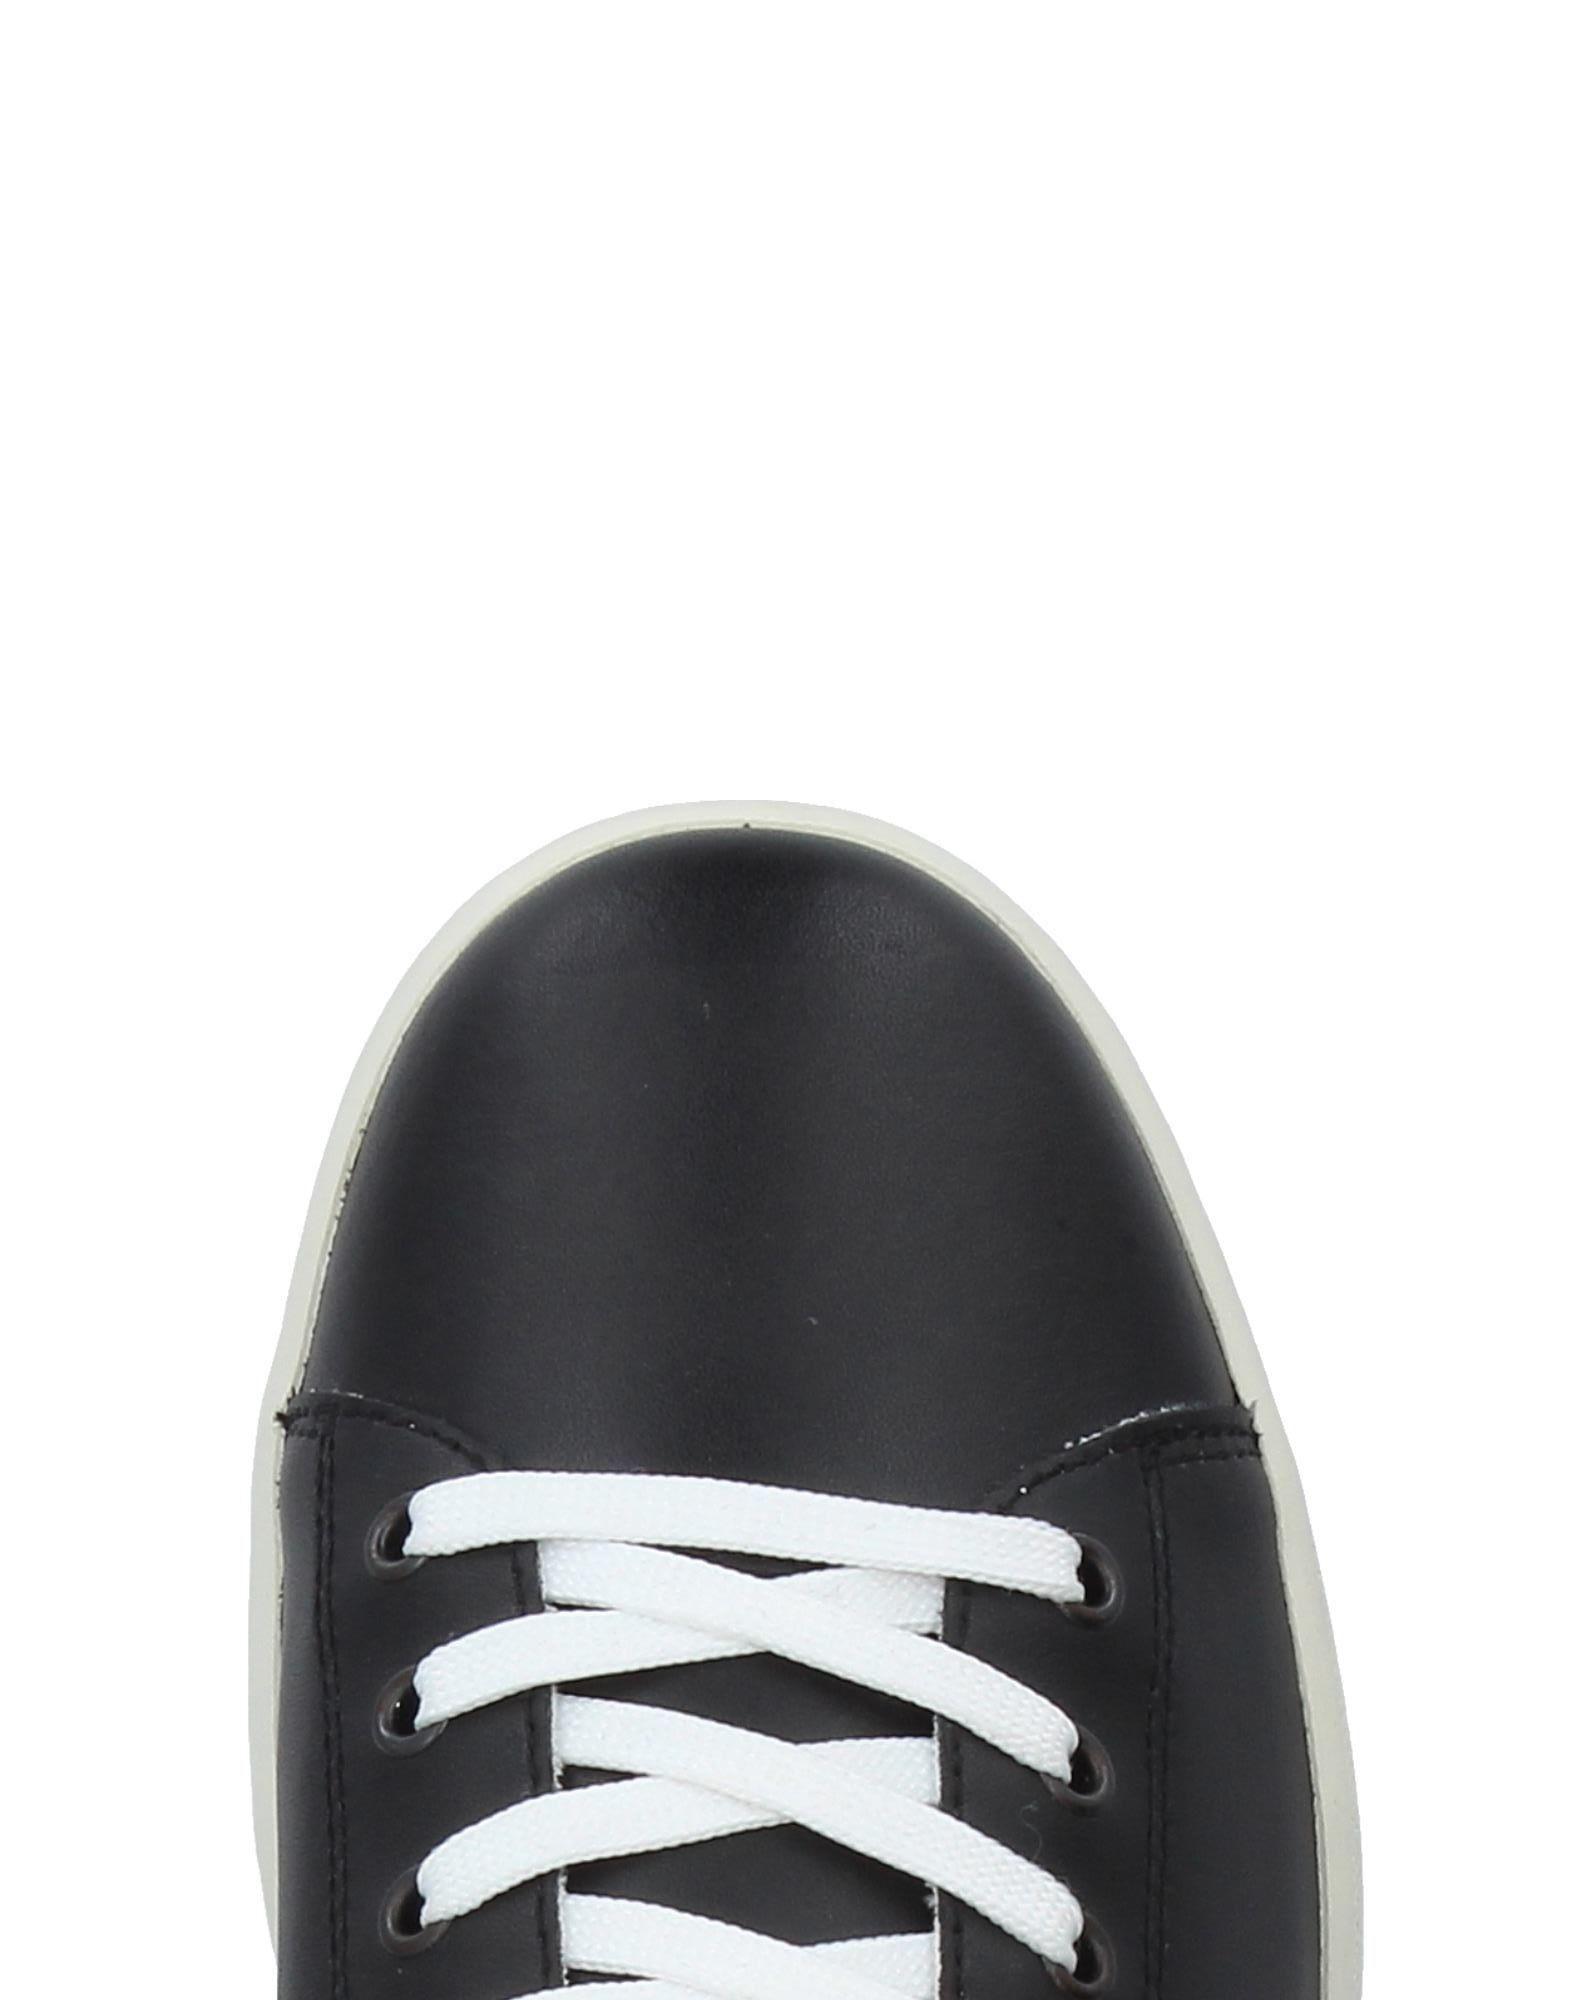 Trussardi Jeans Sneakers Herren  11377740RK Neue Neue 11377740RK Schuhe 253f77